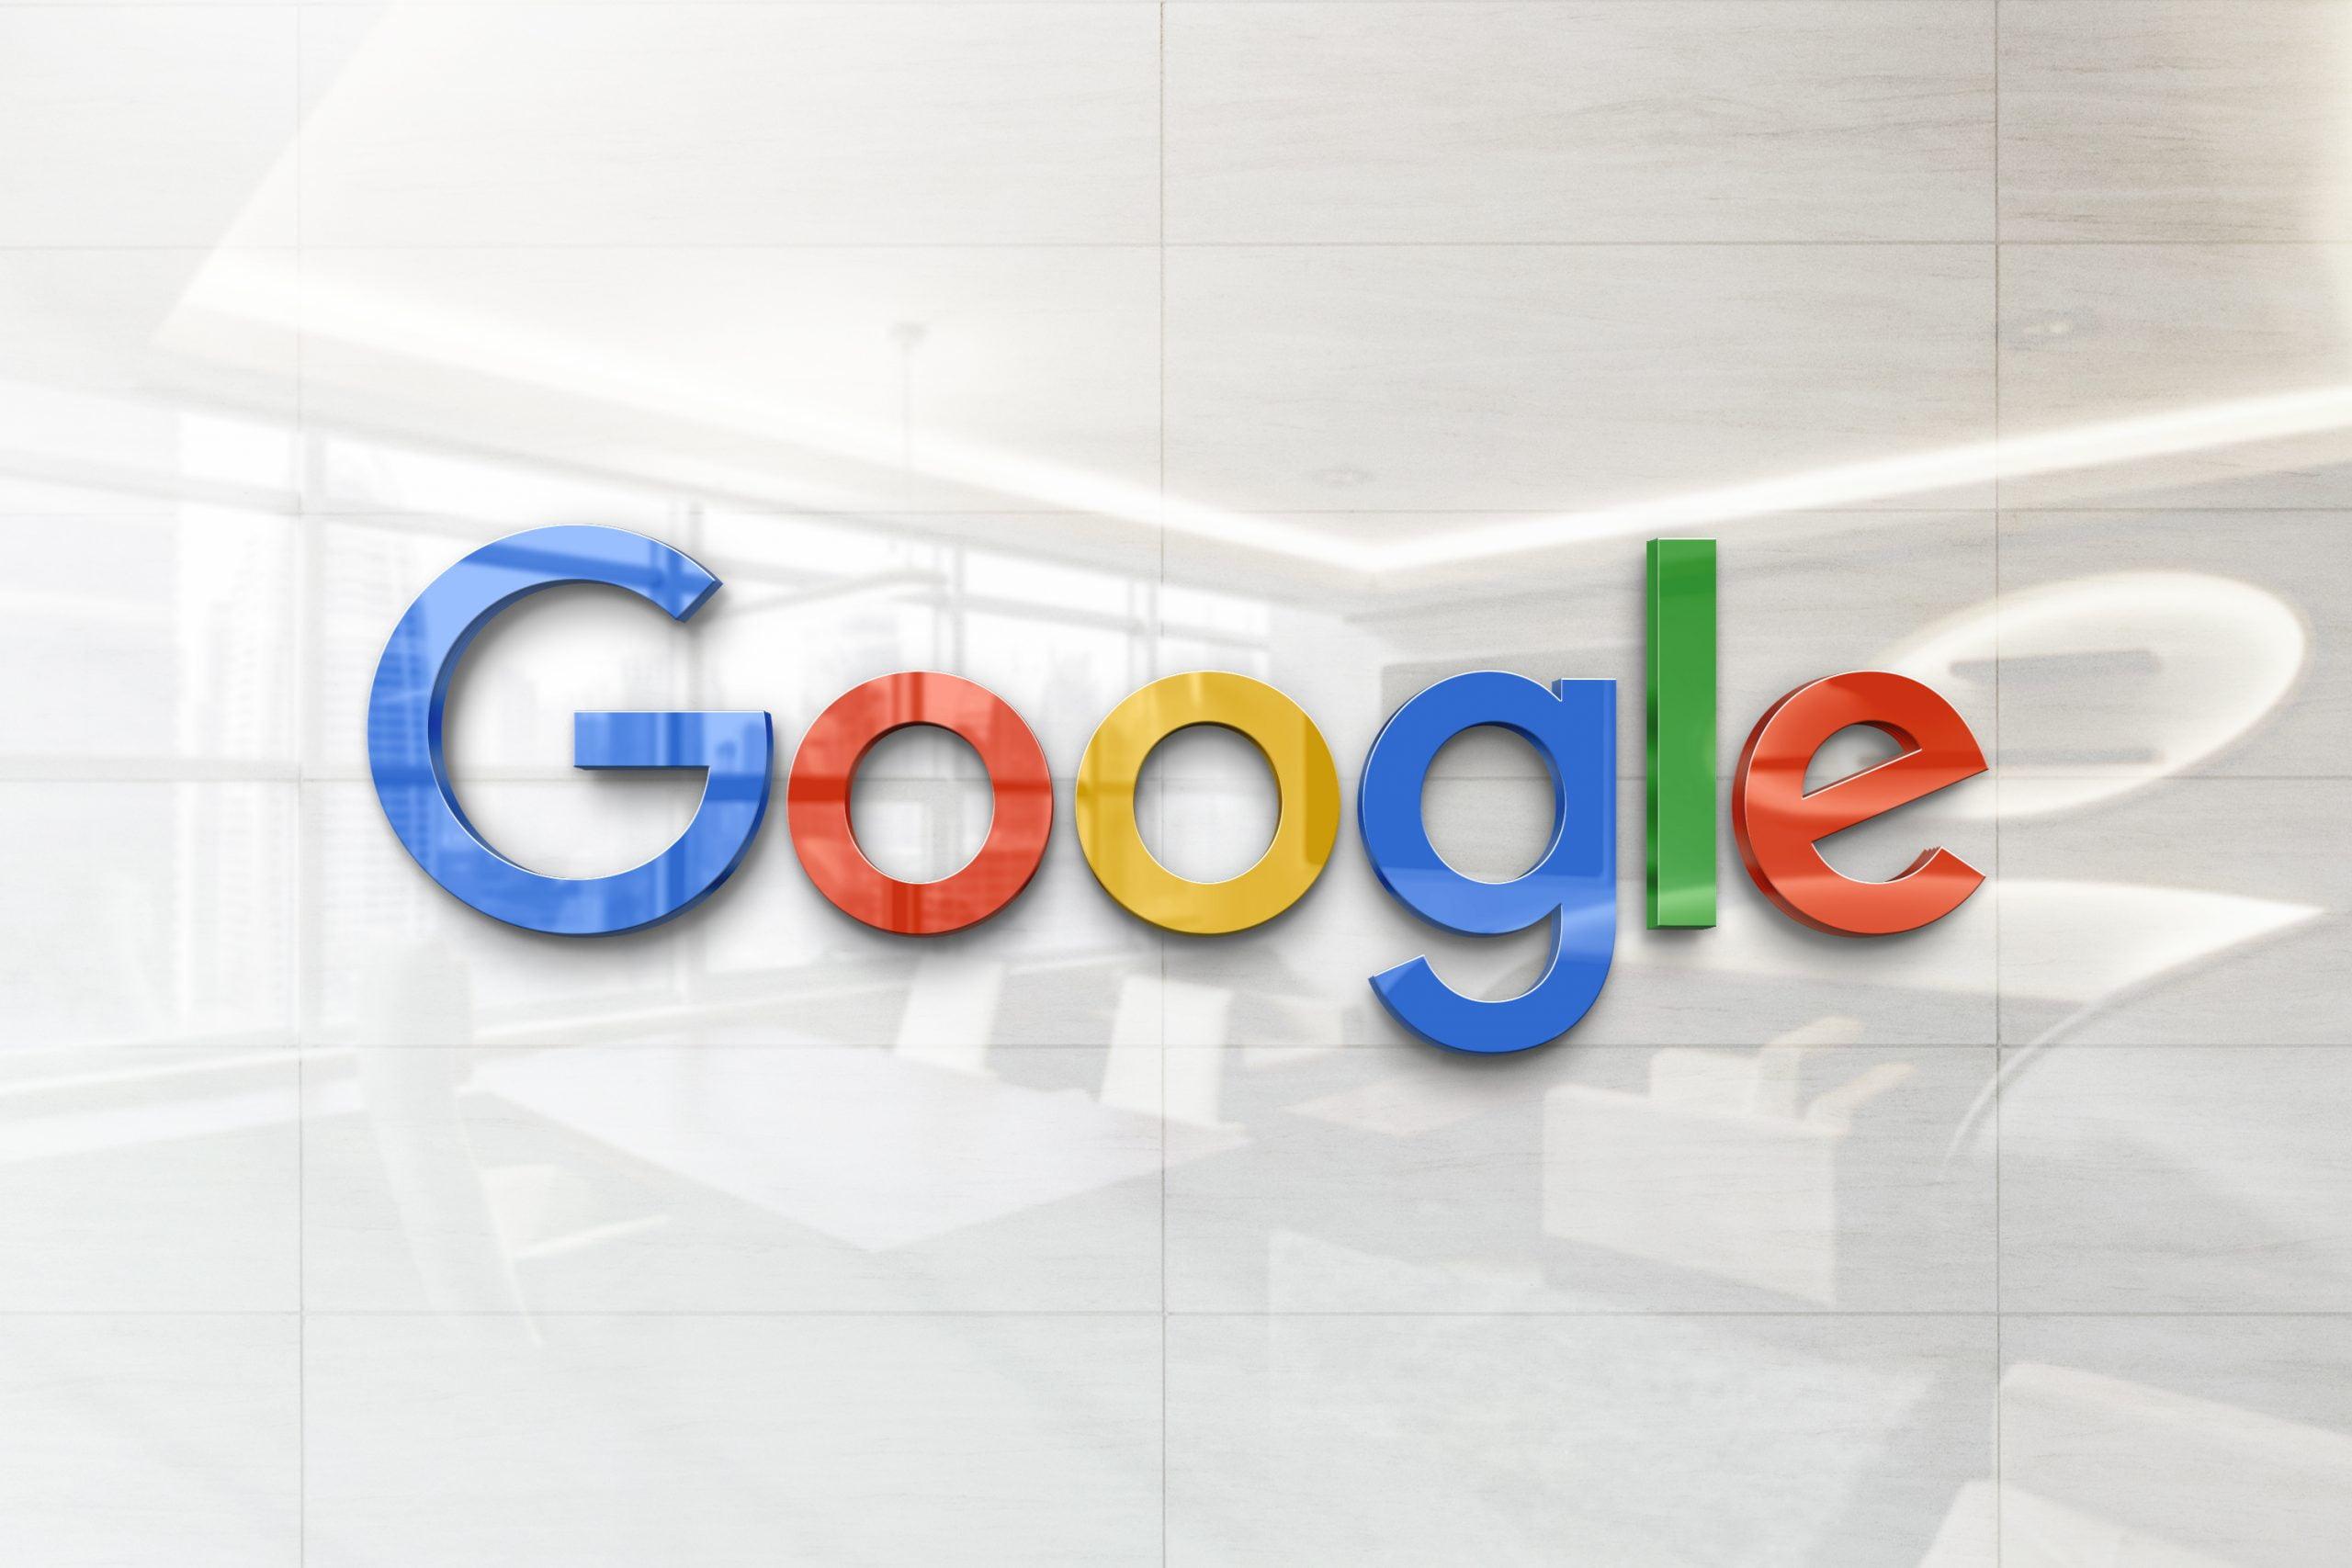 Glossy Wall Logo Mockup - Google